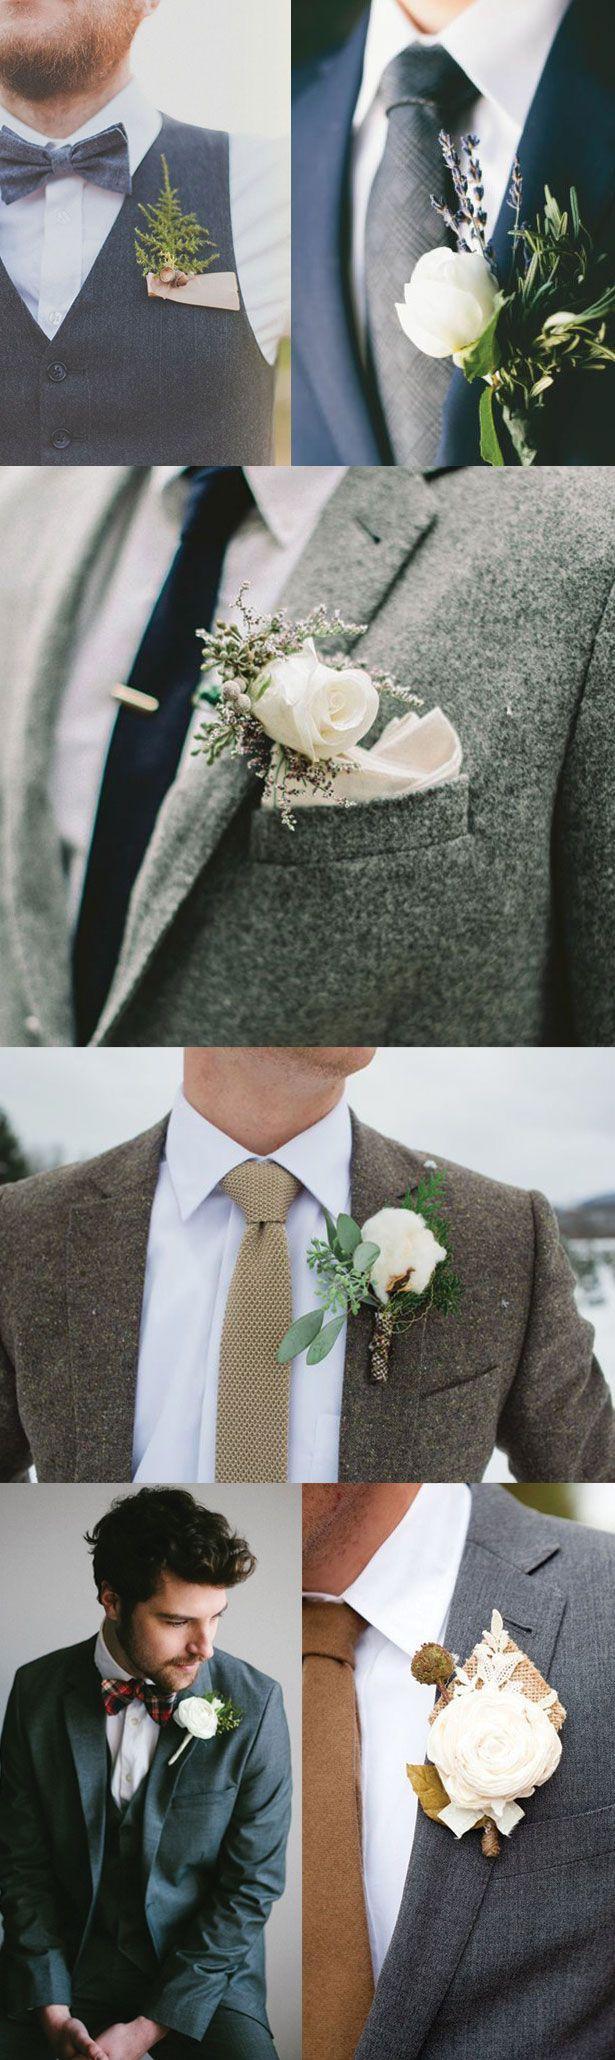 Hochzeit - Winter Groom's Style Guide